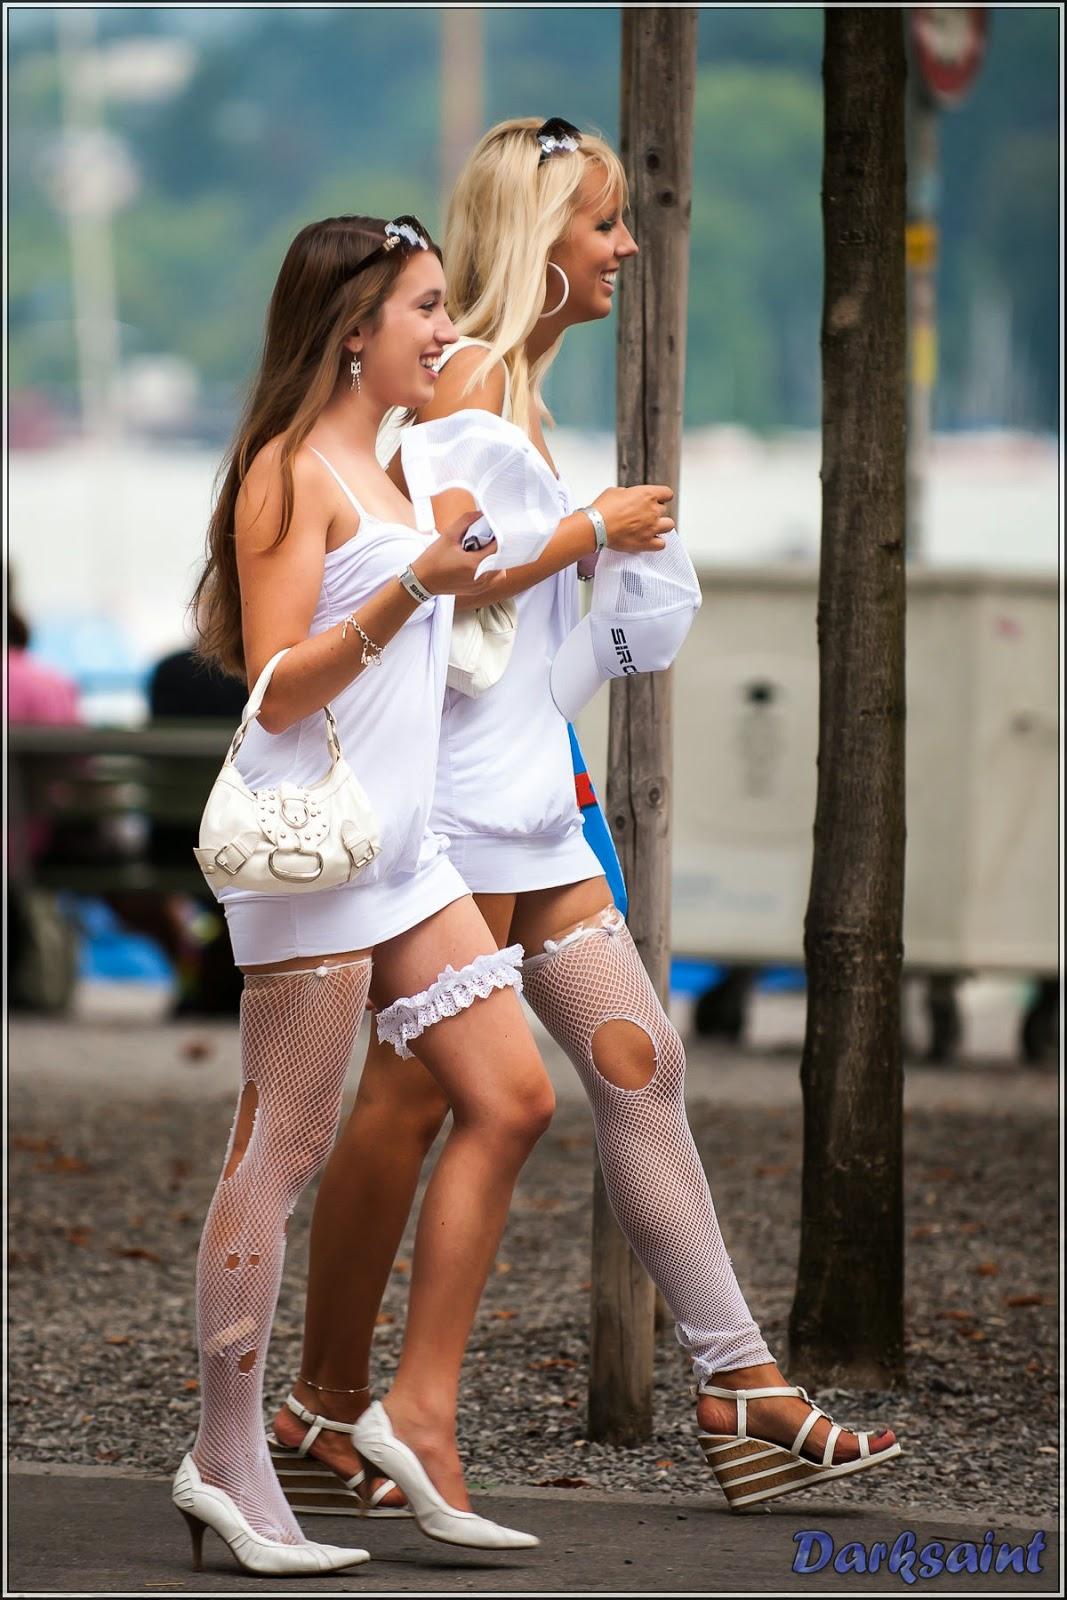 En la calle minifalda ajustada negra de una rica nalgona - 2 9